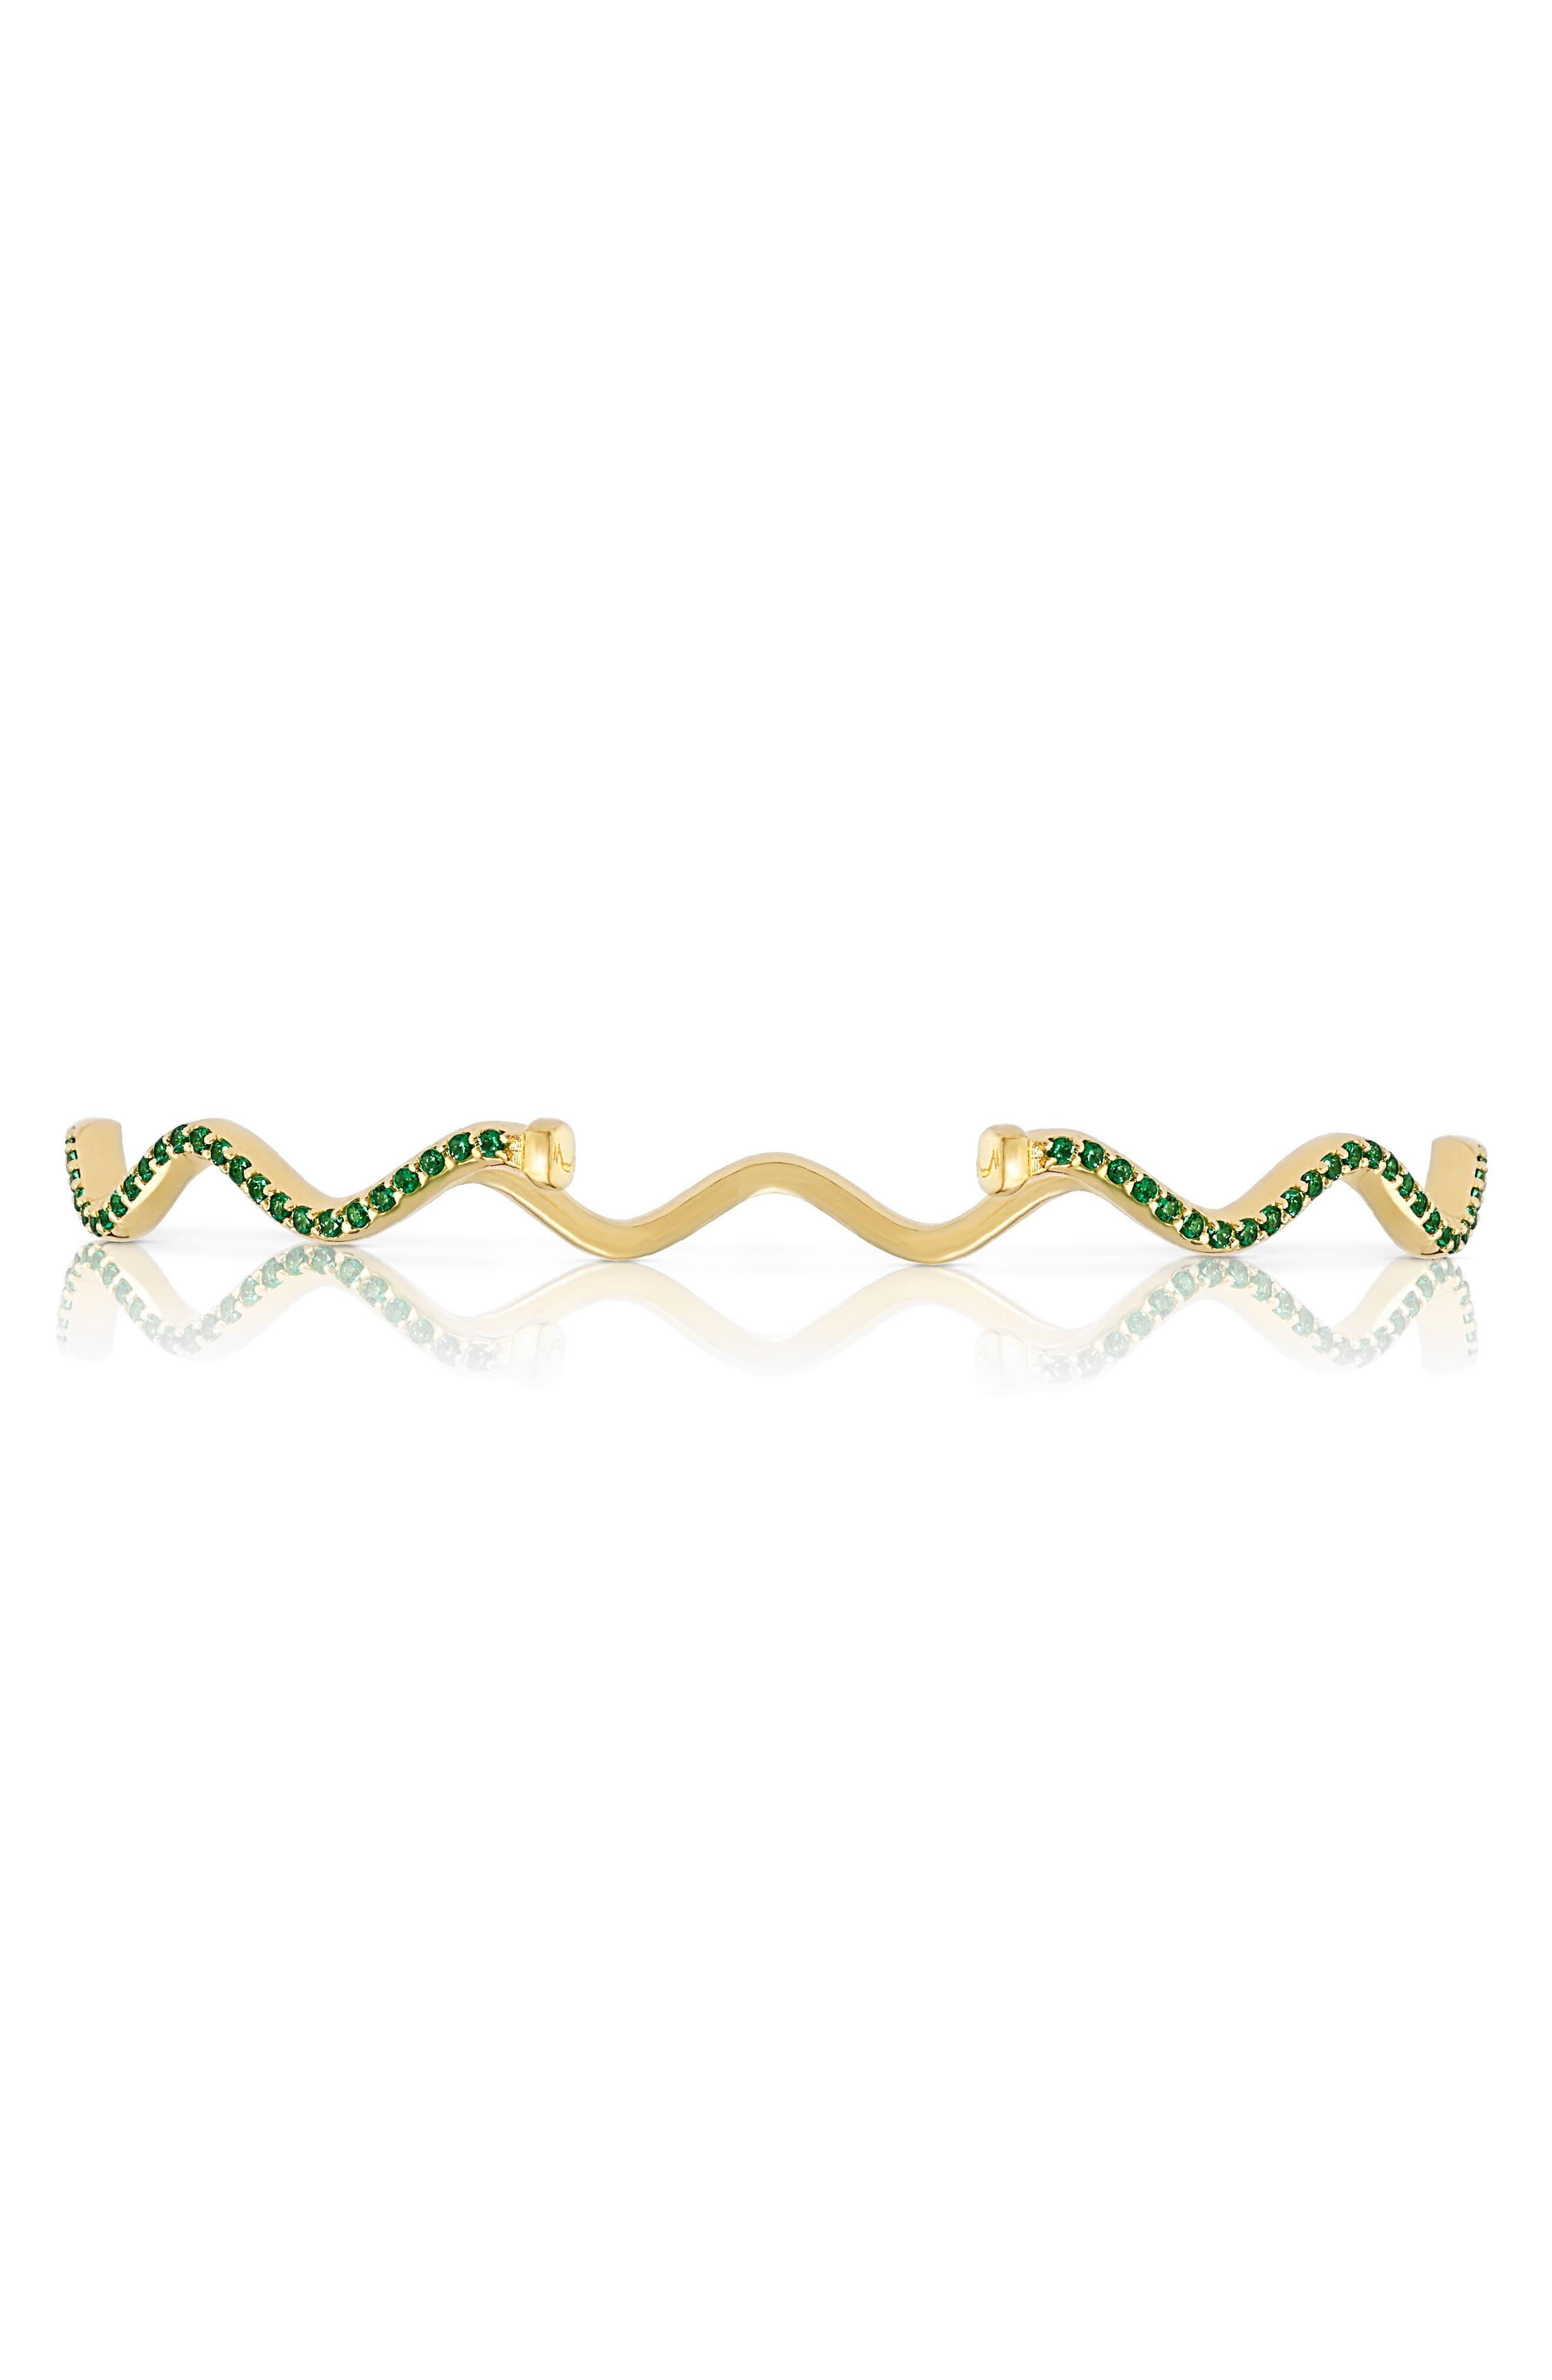 Alternate Image 3  - Sabine Getty Baby Memphis Solid Wave Tsavorite Cuff Bracelet